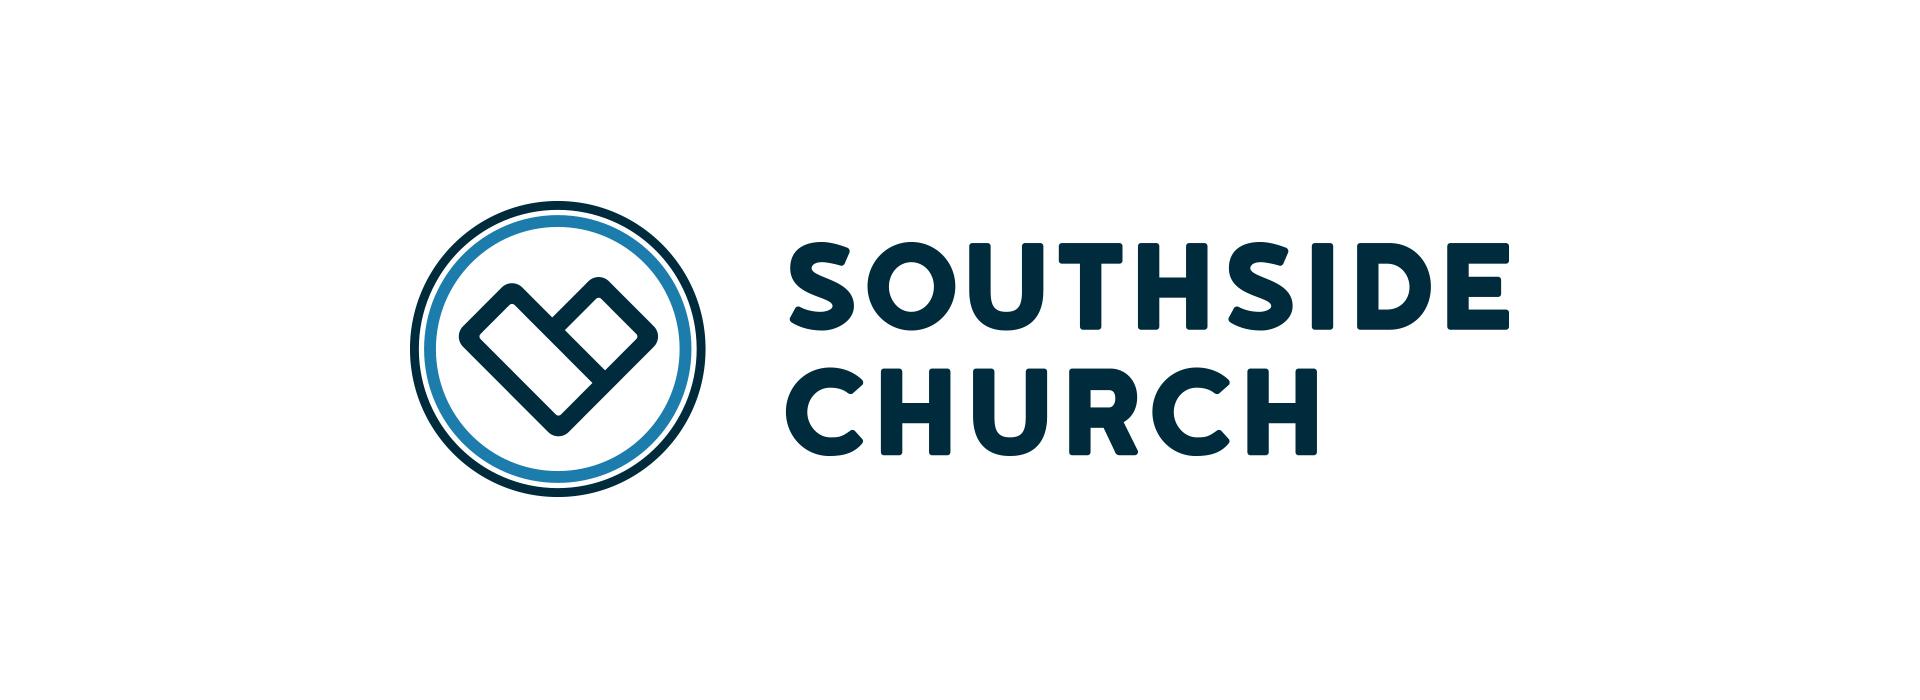 south2_case study - header icon.jpg